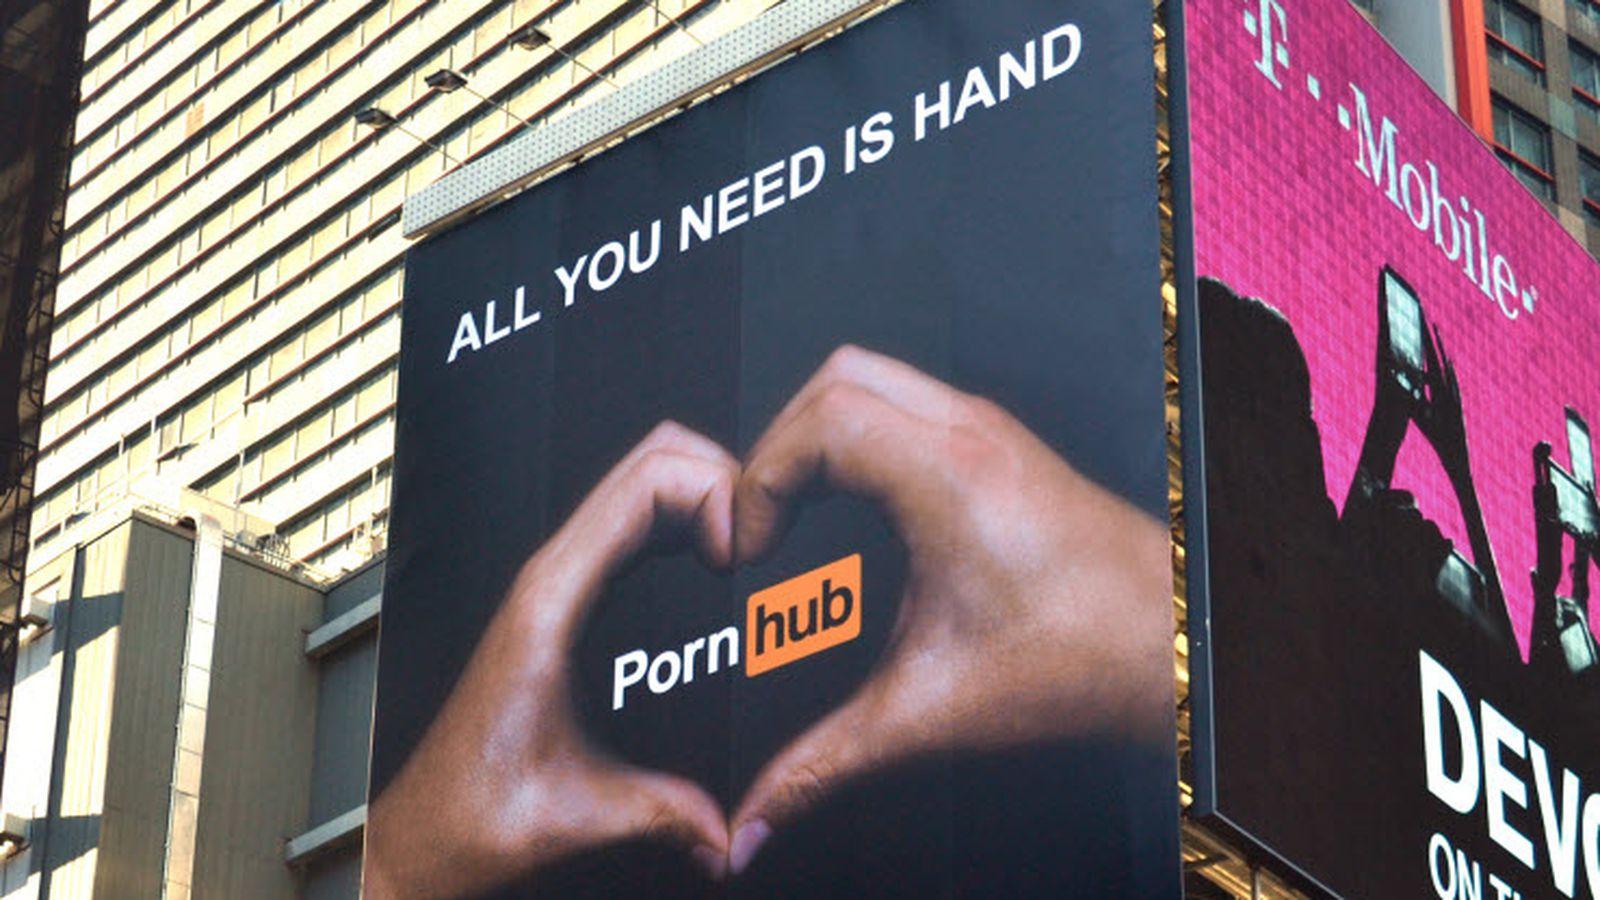 you porno hub